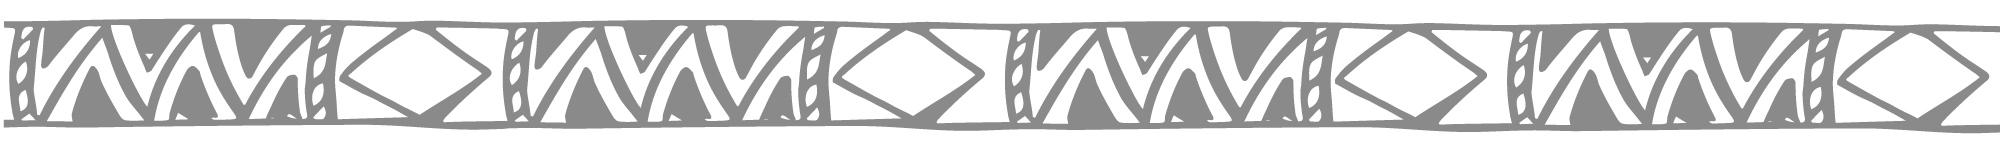 Tribal-Line-Light-Grey.jpg